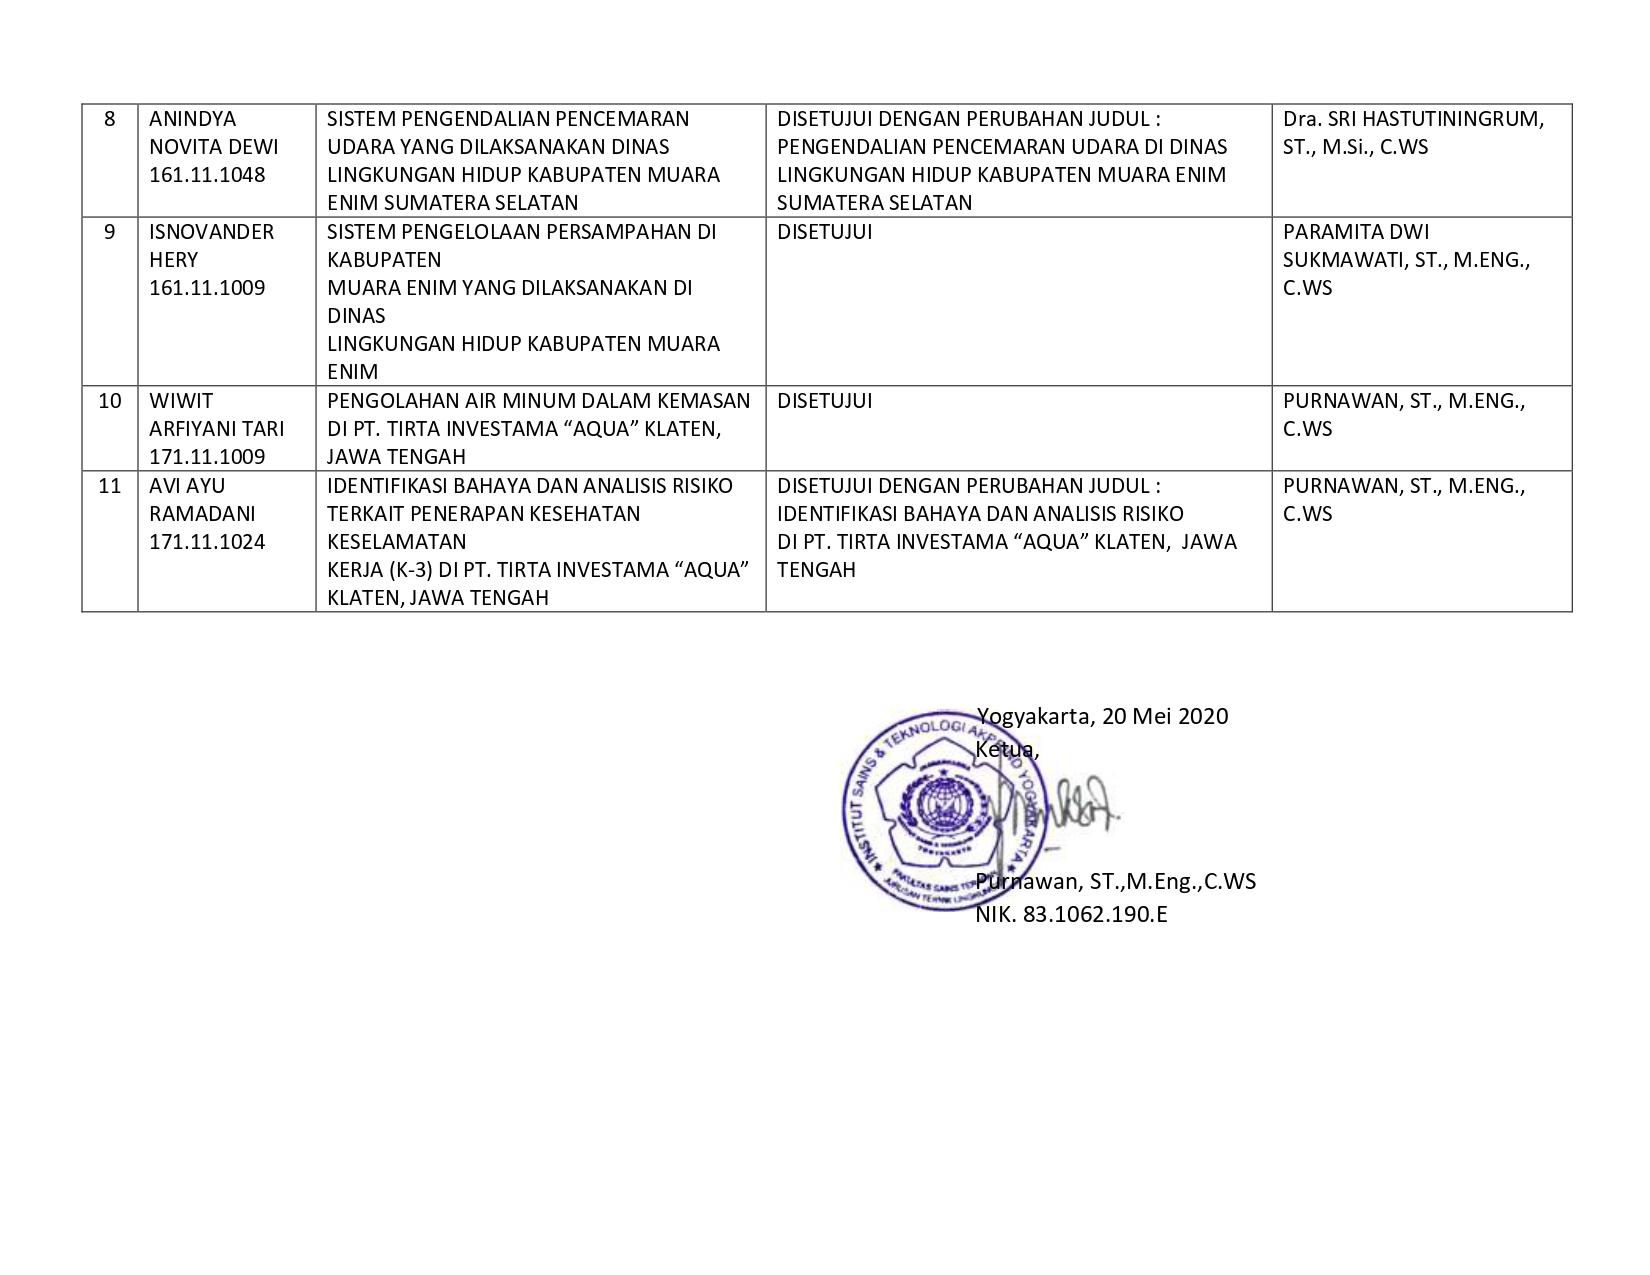 PENGUMUMAN SELEKSI KP MEI 2020 (1)_page-0002